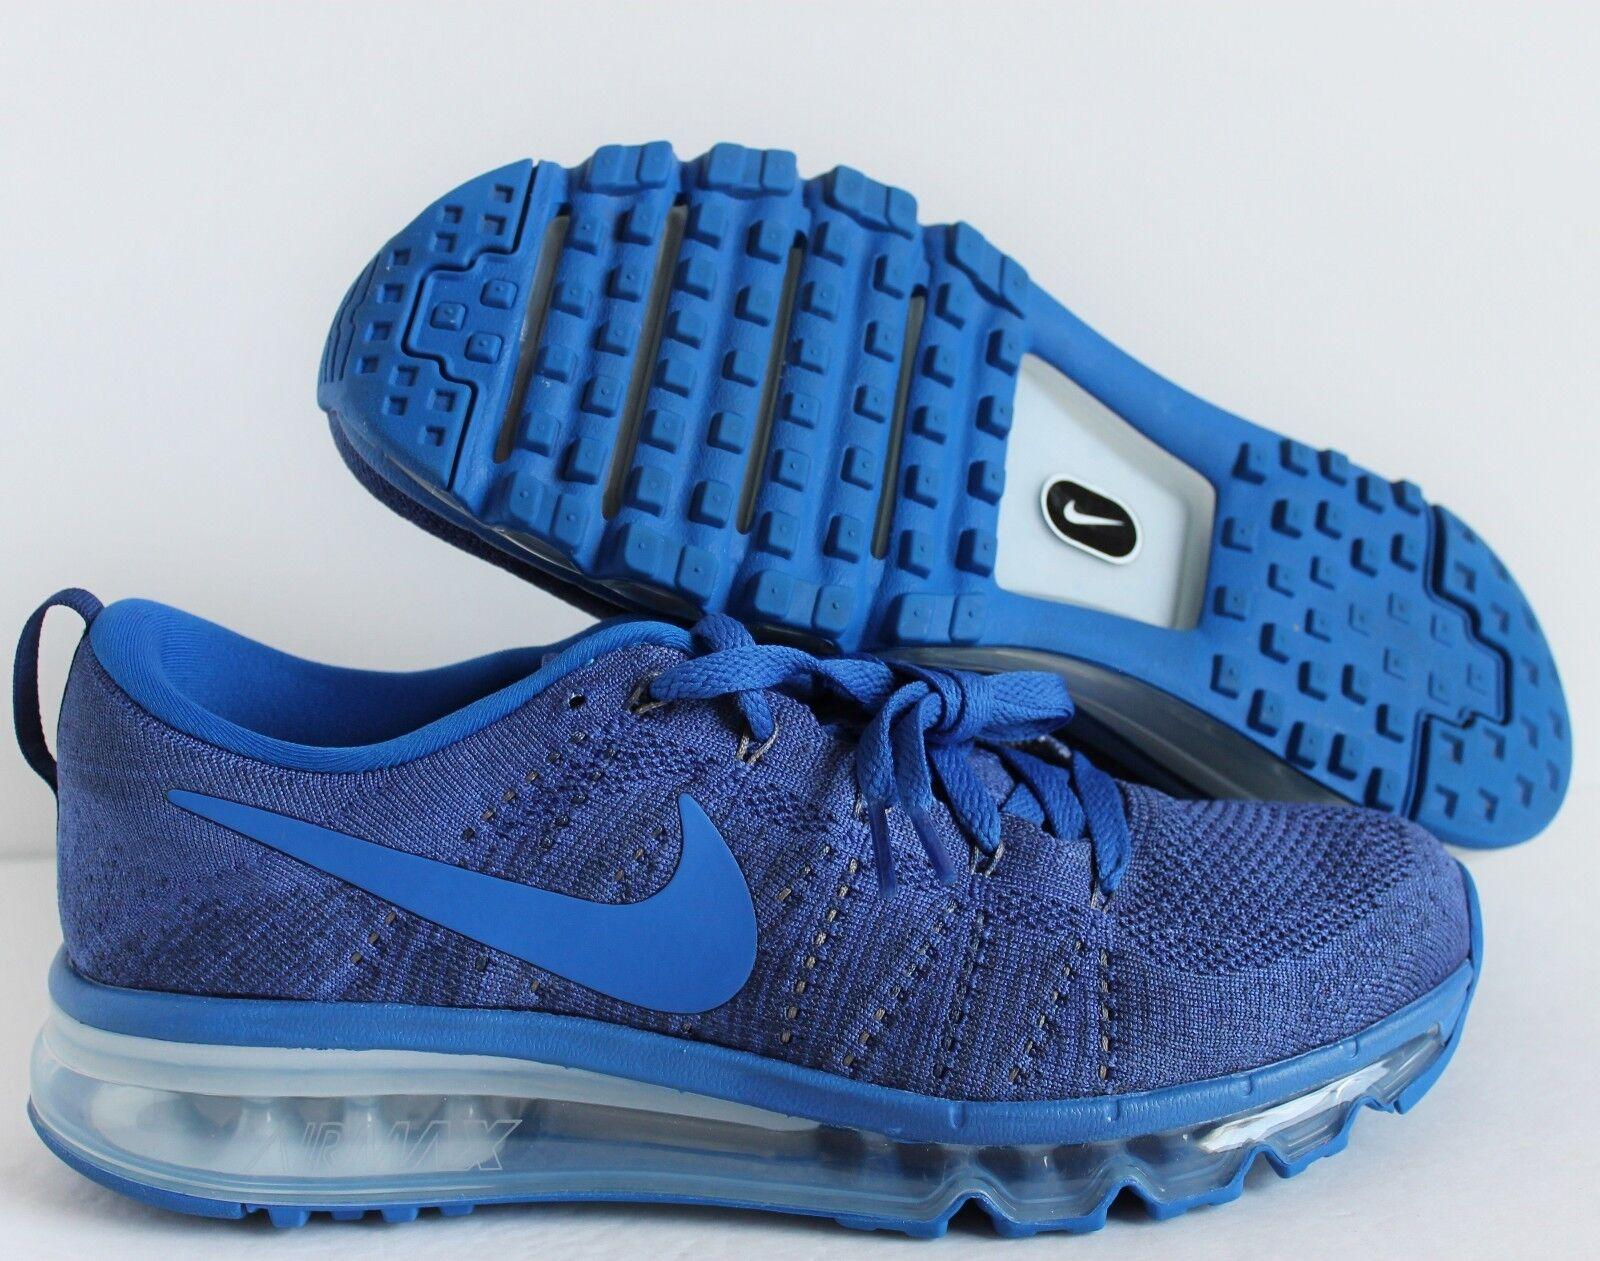 Nike Men's Air Max Flyknit ID bluee-Grey SZ 8